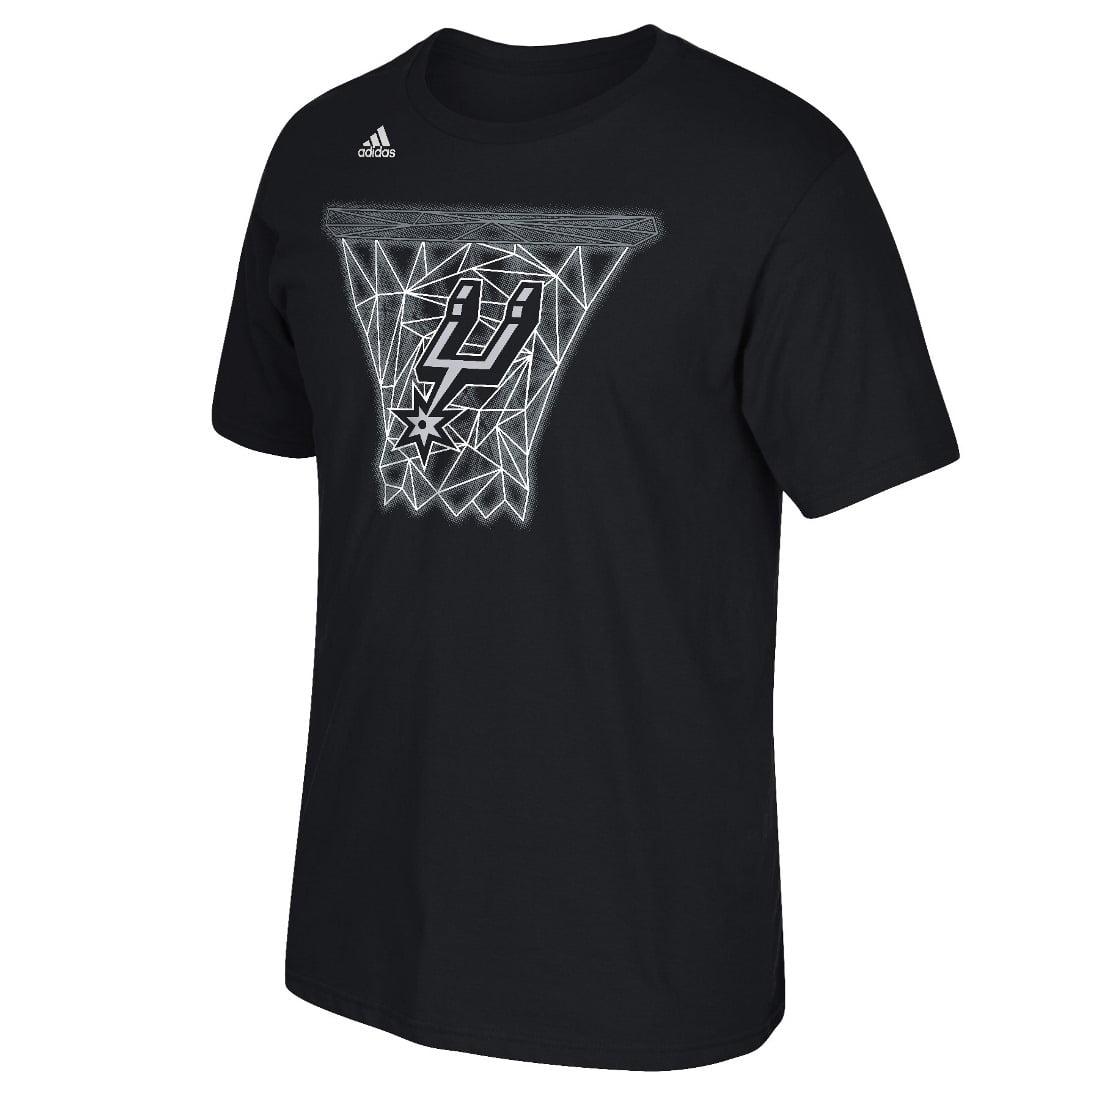 "San Antonio Spurs Adidas NBA ""Net Web"" Men's Short Sleeve T-Shirt"